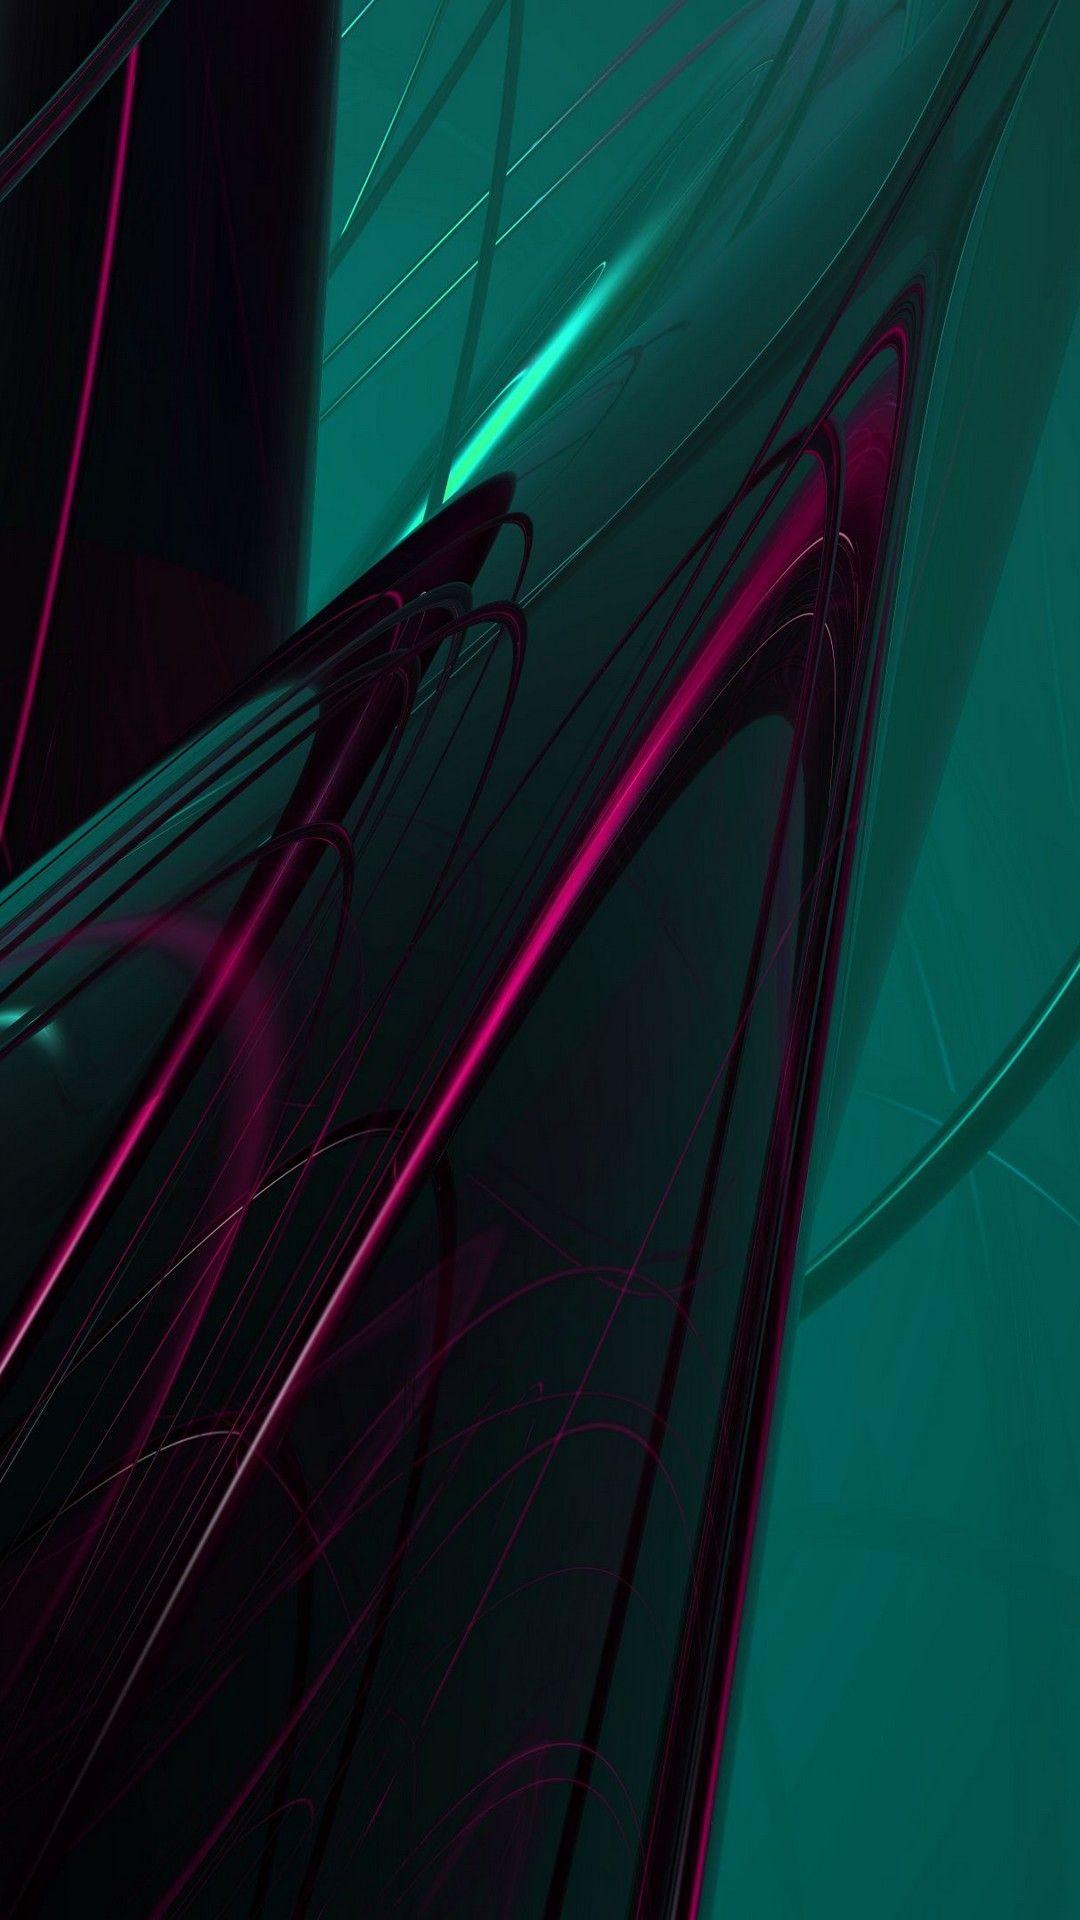 Teal Iphone Wallpaper Hd 2021 Live Wallpaper Hd 8k Wallpaper Color Wallpaper Iphone 8k Wallpaper For Mobile